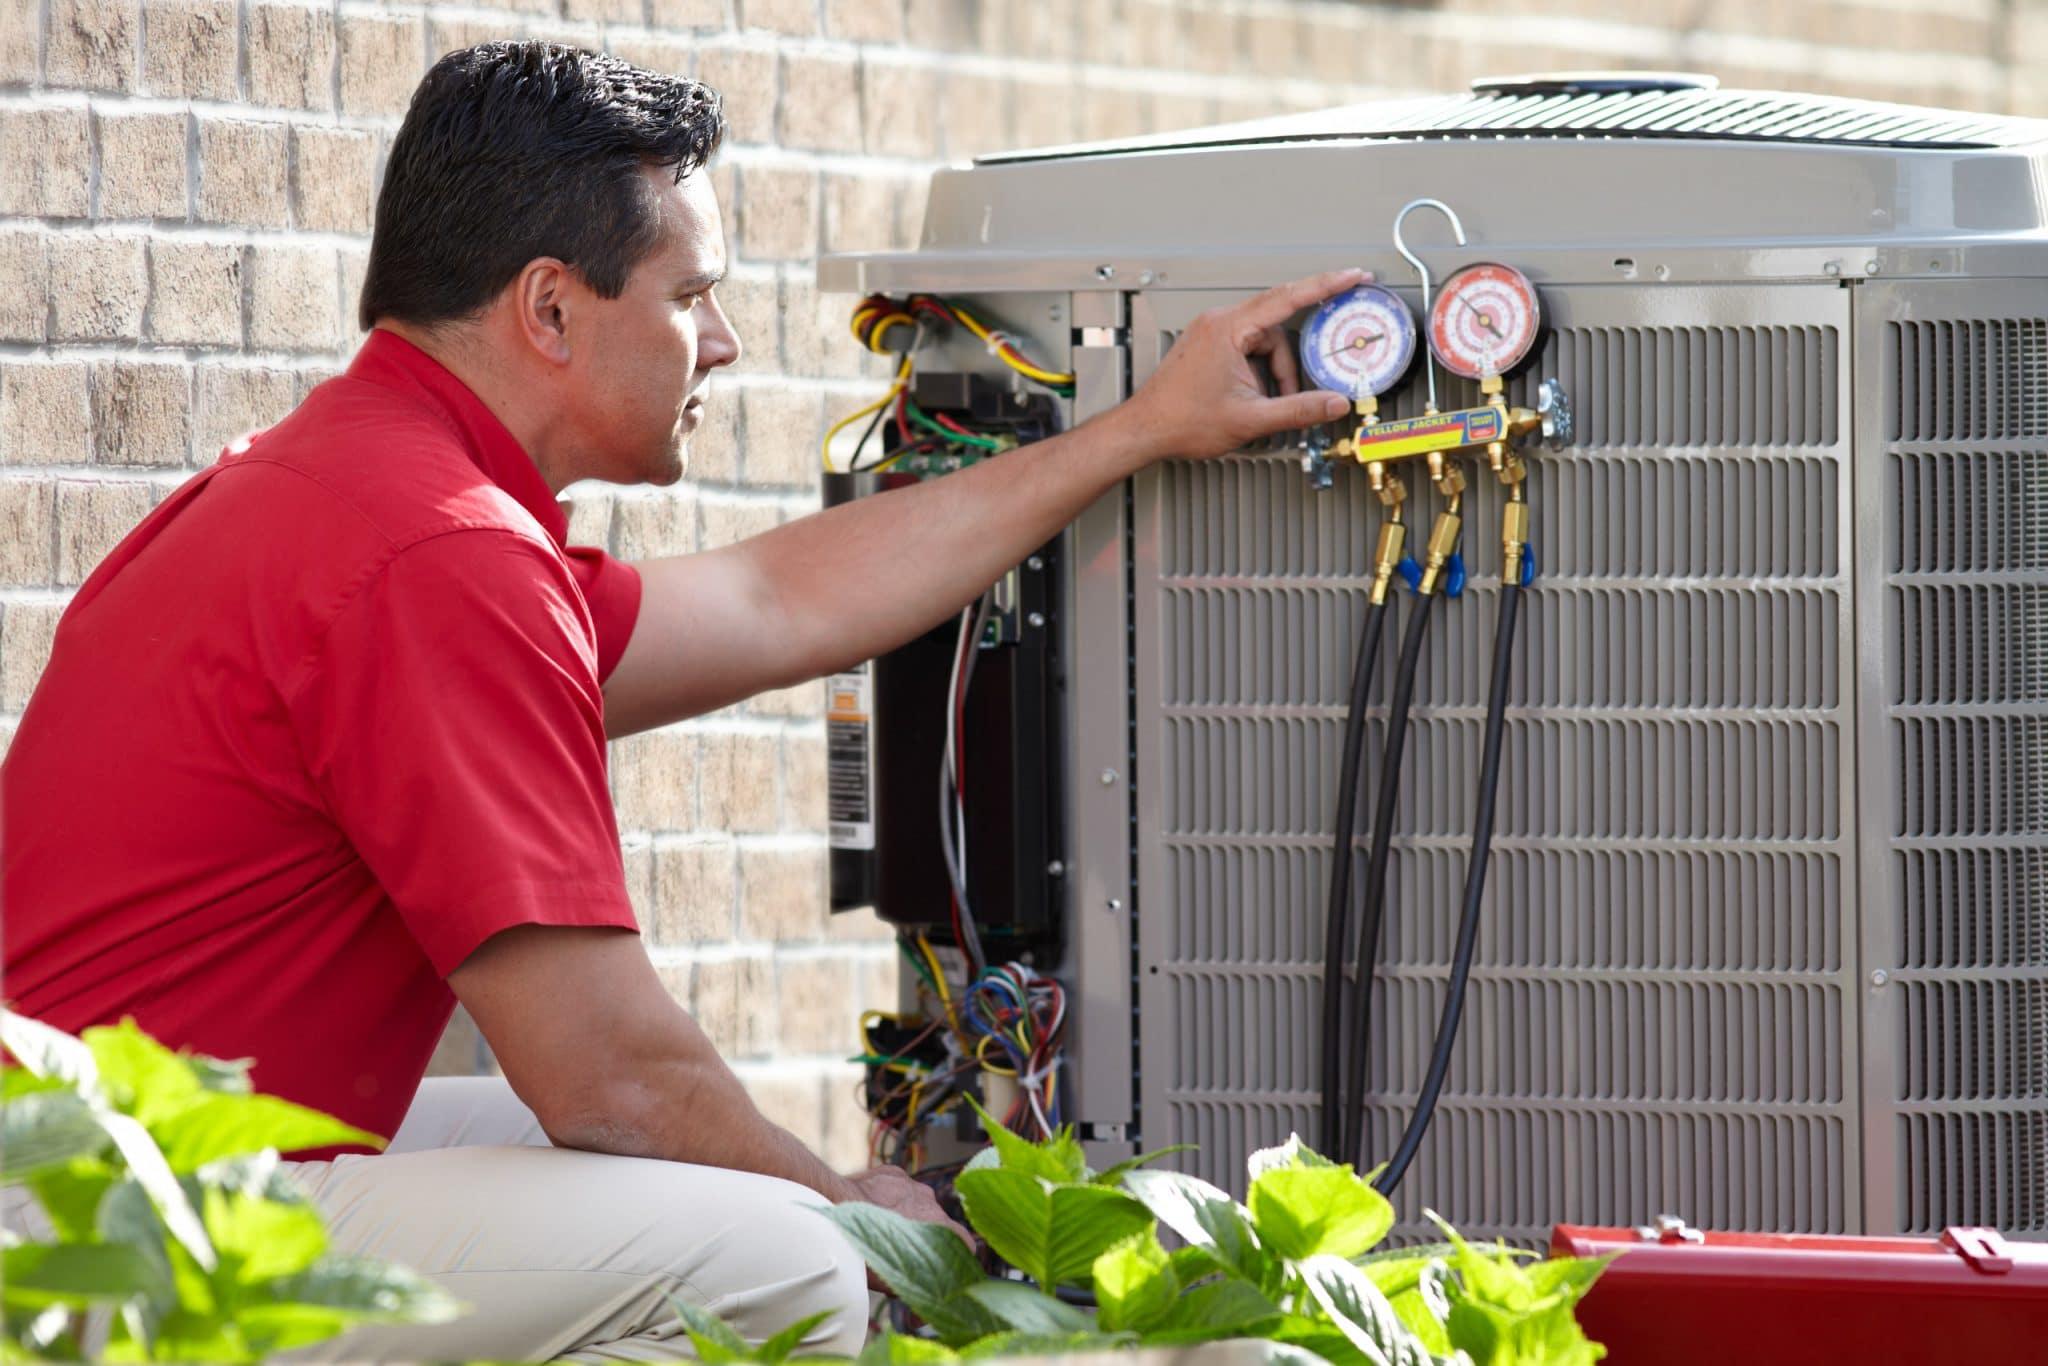 Refrigerator Repair Services Importance & Benefits